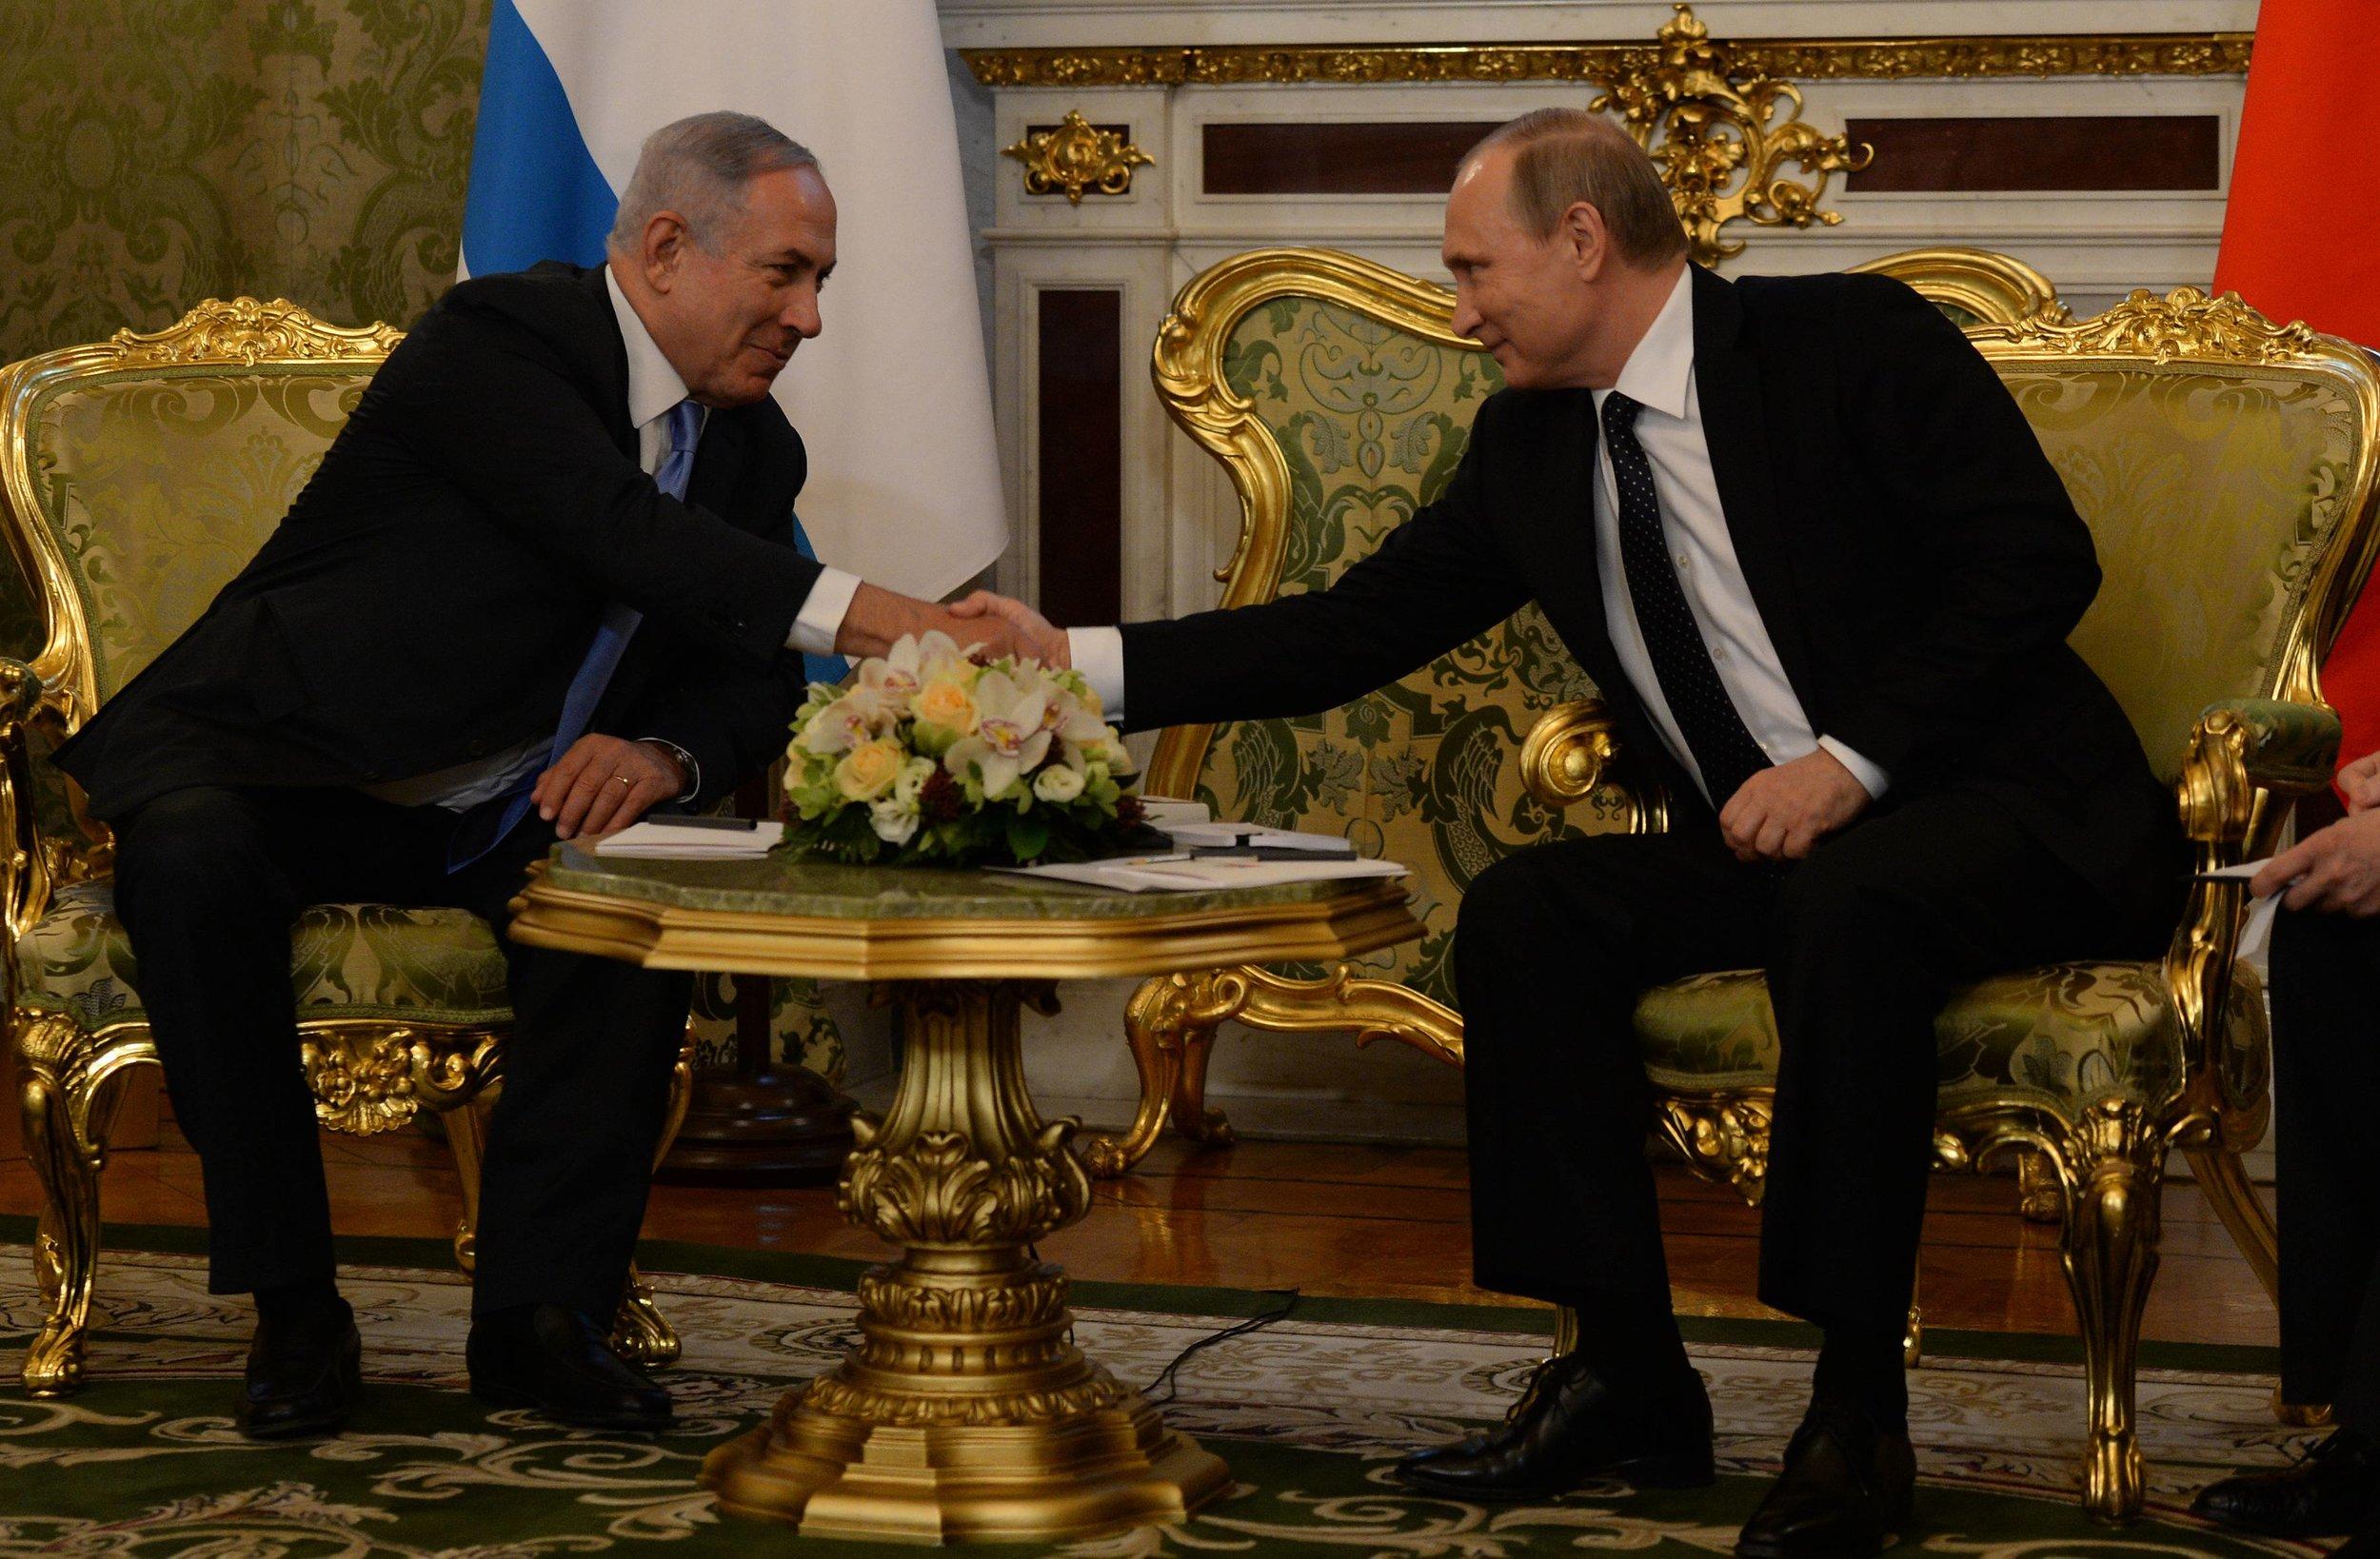 Israeli Prime Minister Benjamin Netanyahu (left) meets with Russian President Vladimir Putin in Moscow June 7, 2016. Credit: Haim Zach/GPO.